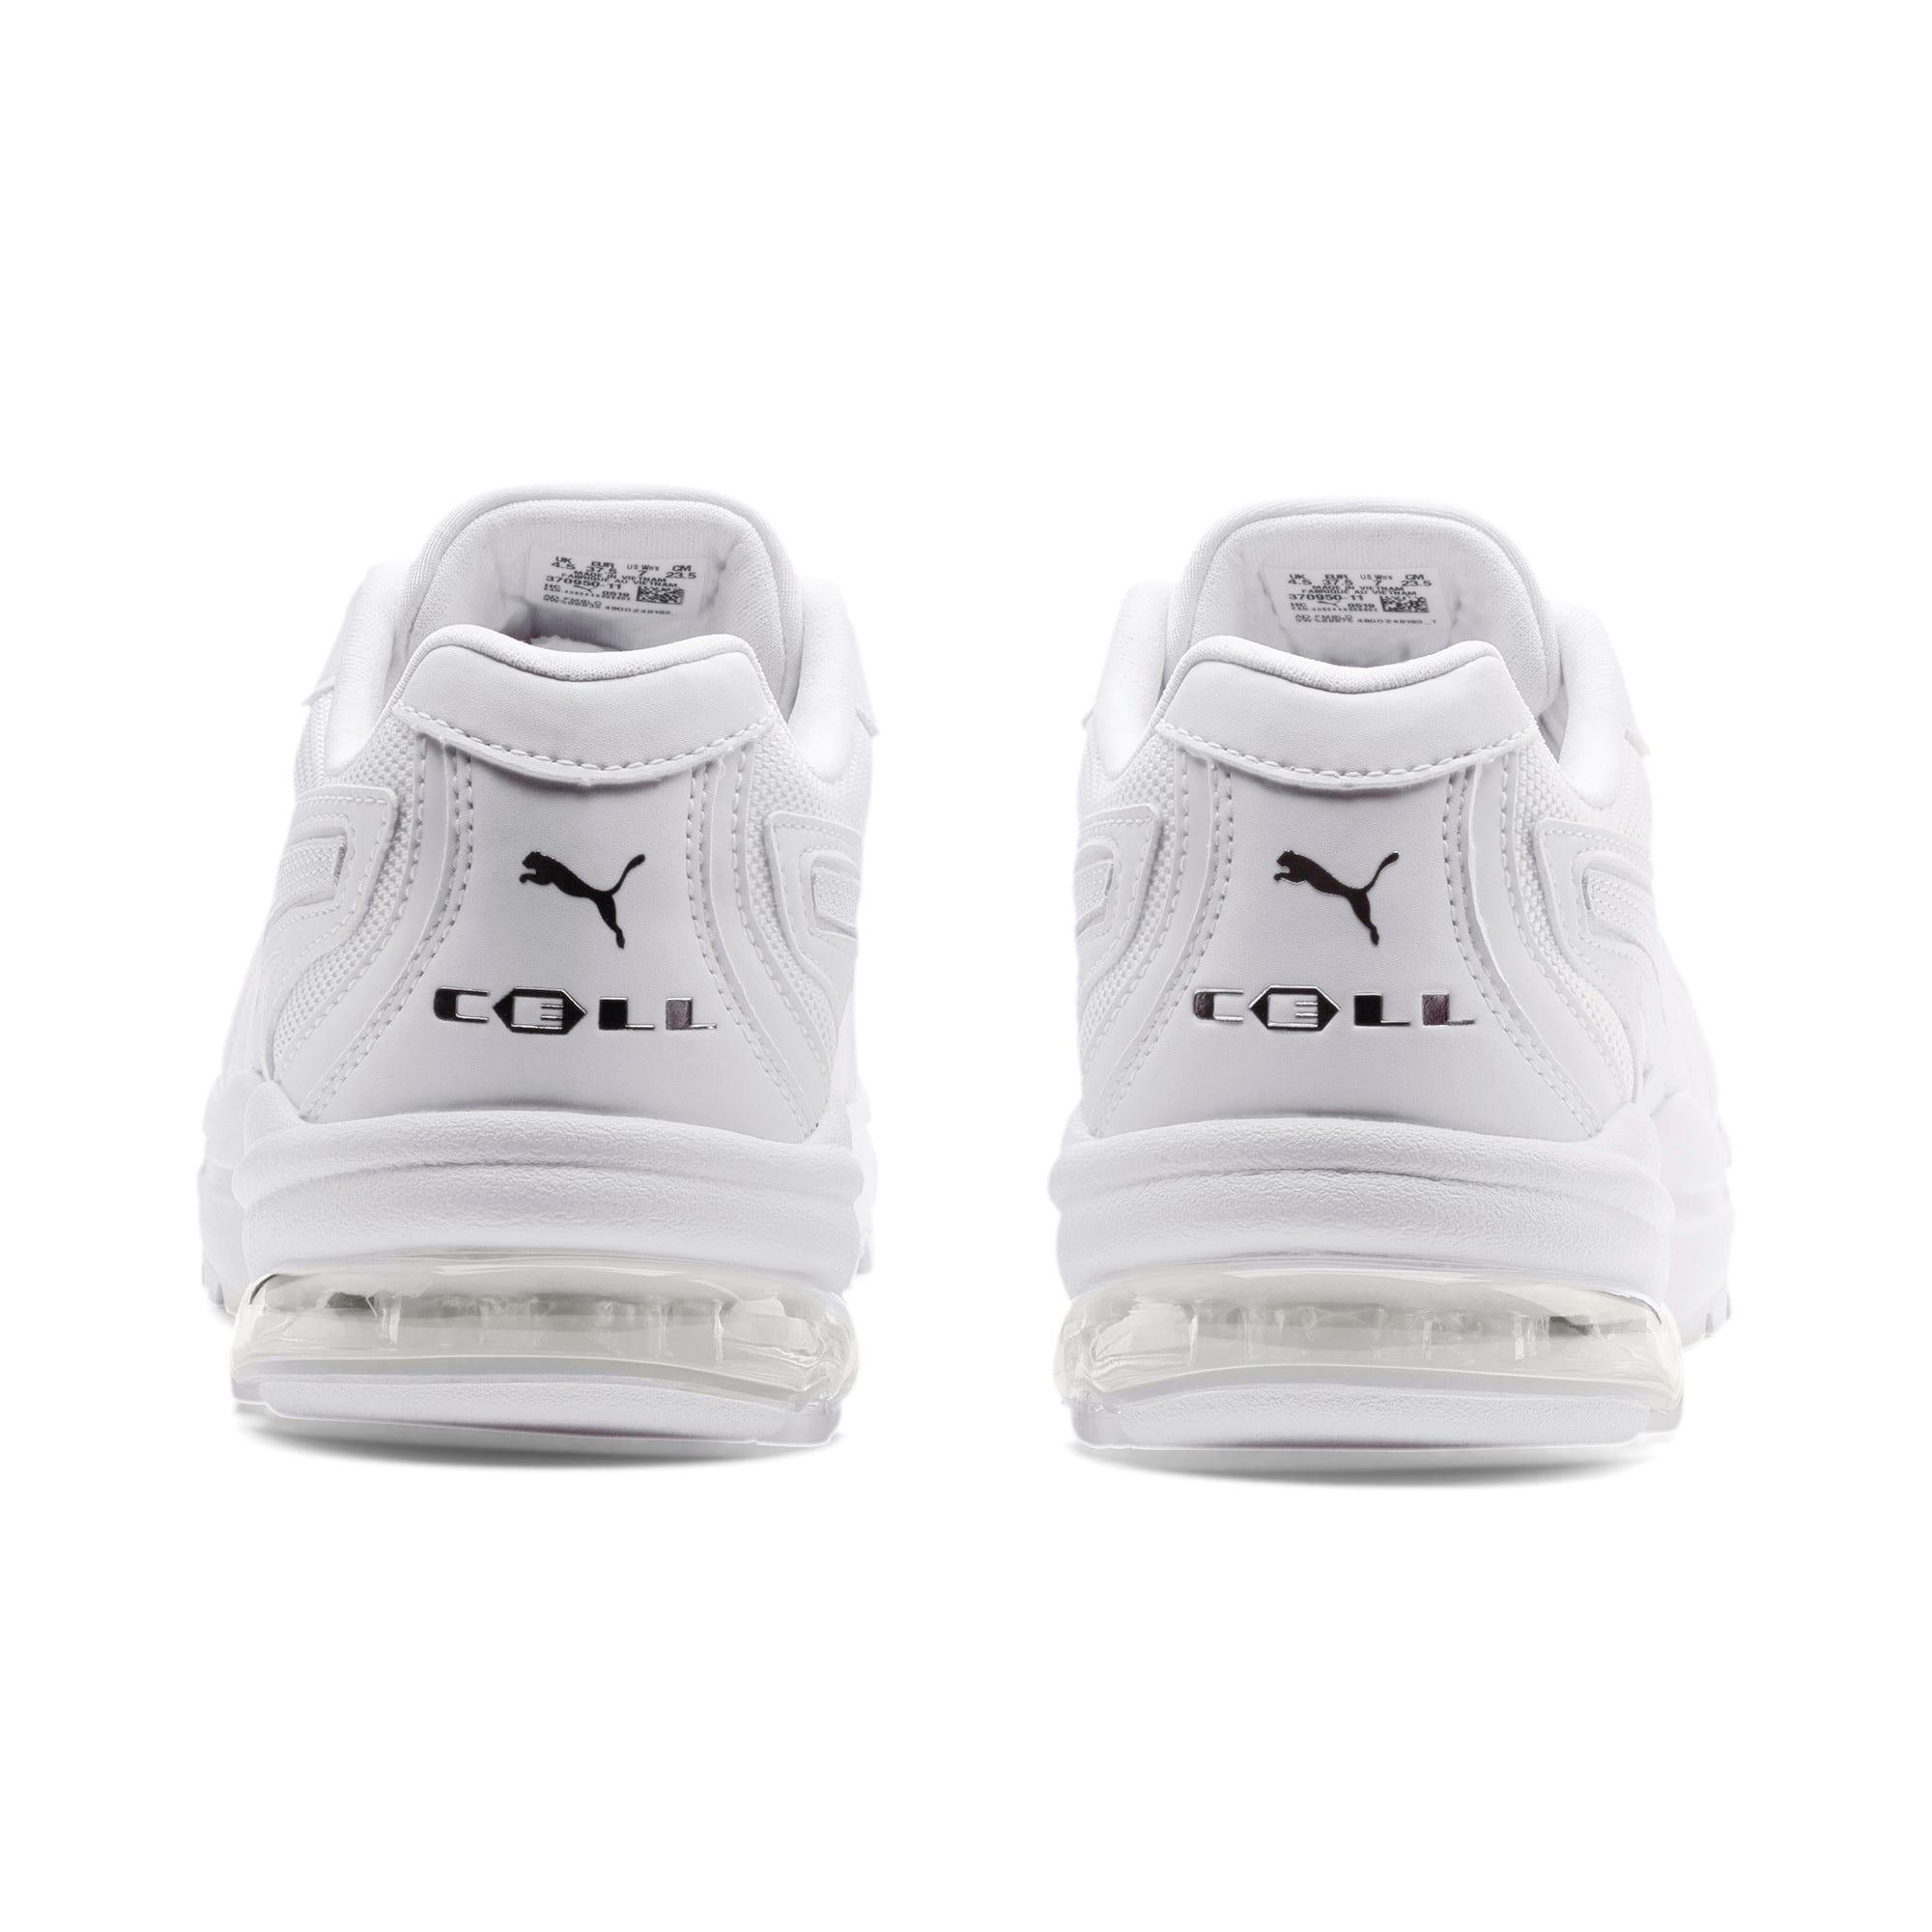 Thumbnail 3 of CELL Stellar Damen Sneaker, Puma White-Silver, medium